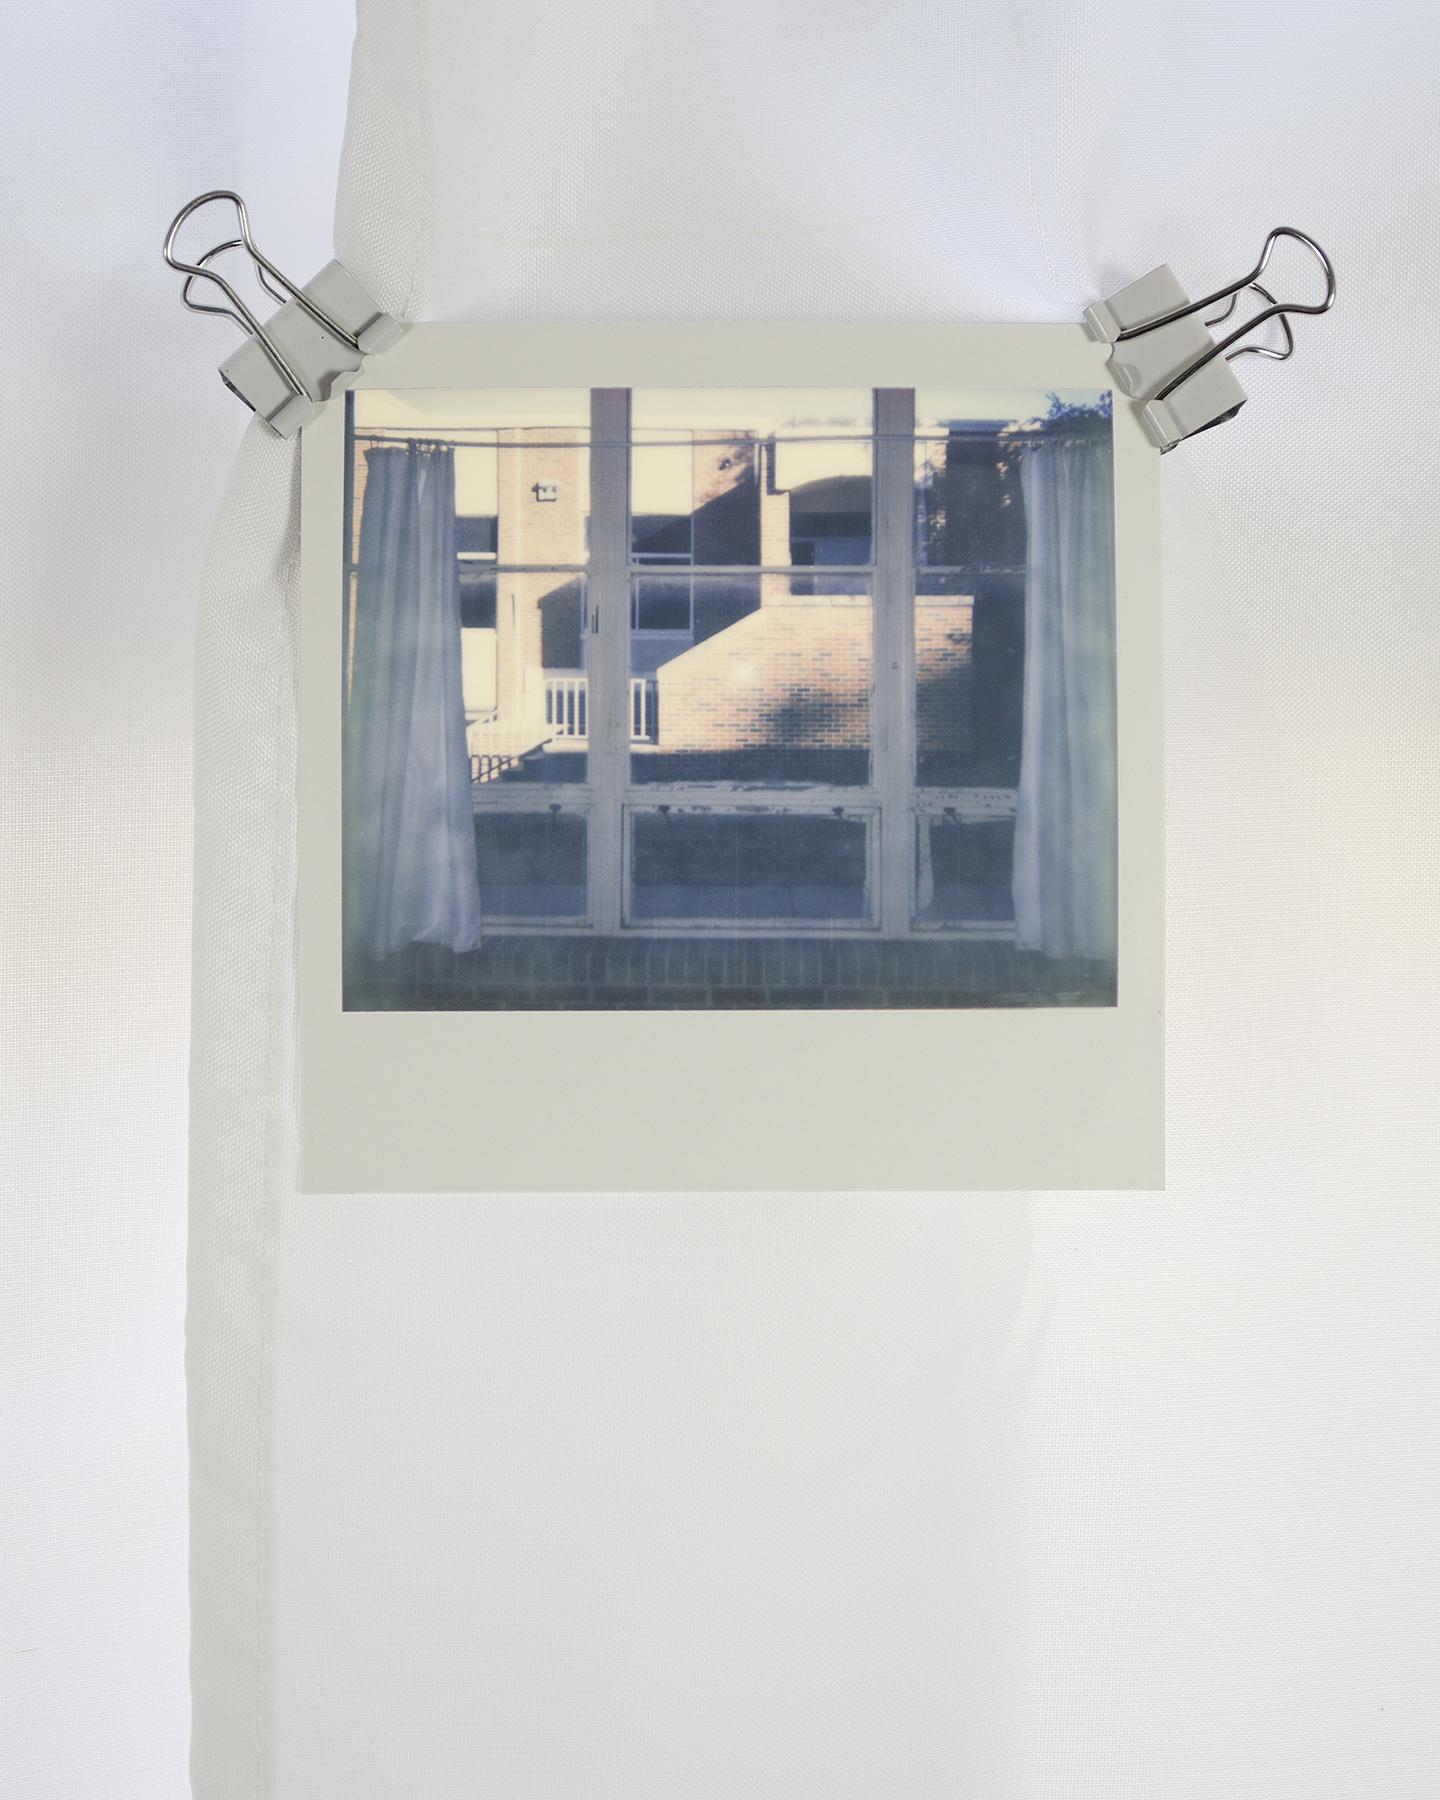 Westley Harwart | Inside Out | Polaroid Spectra 2